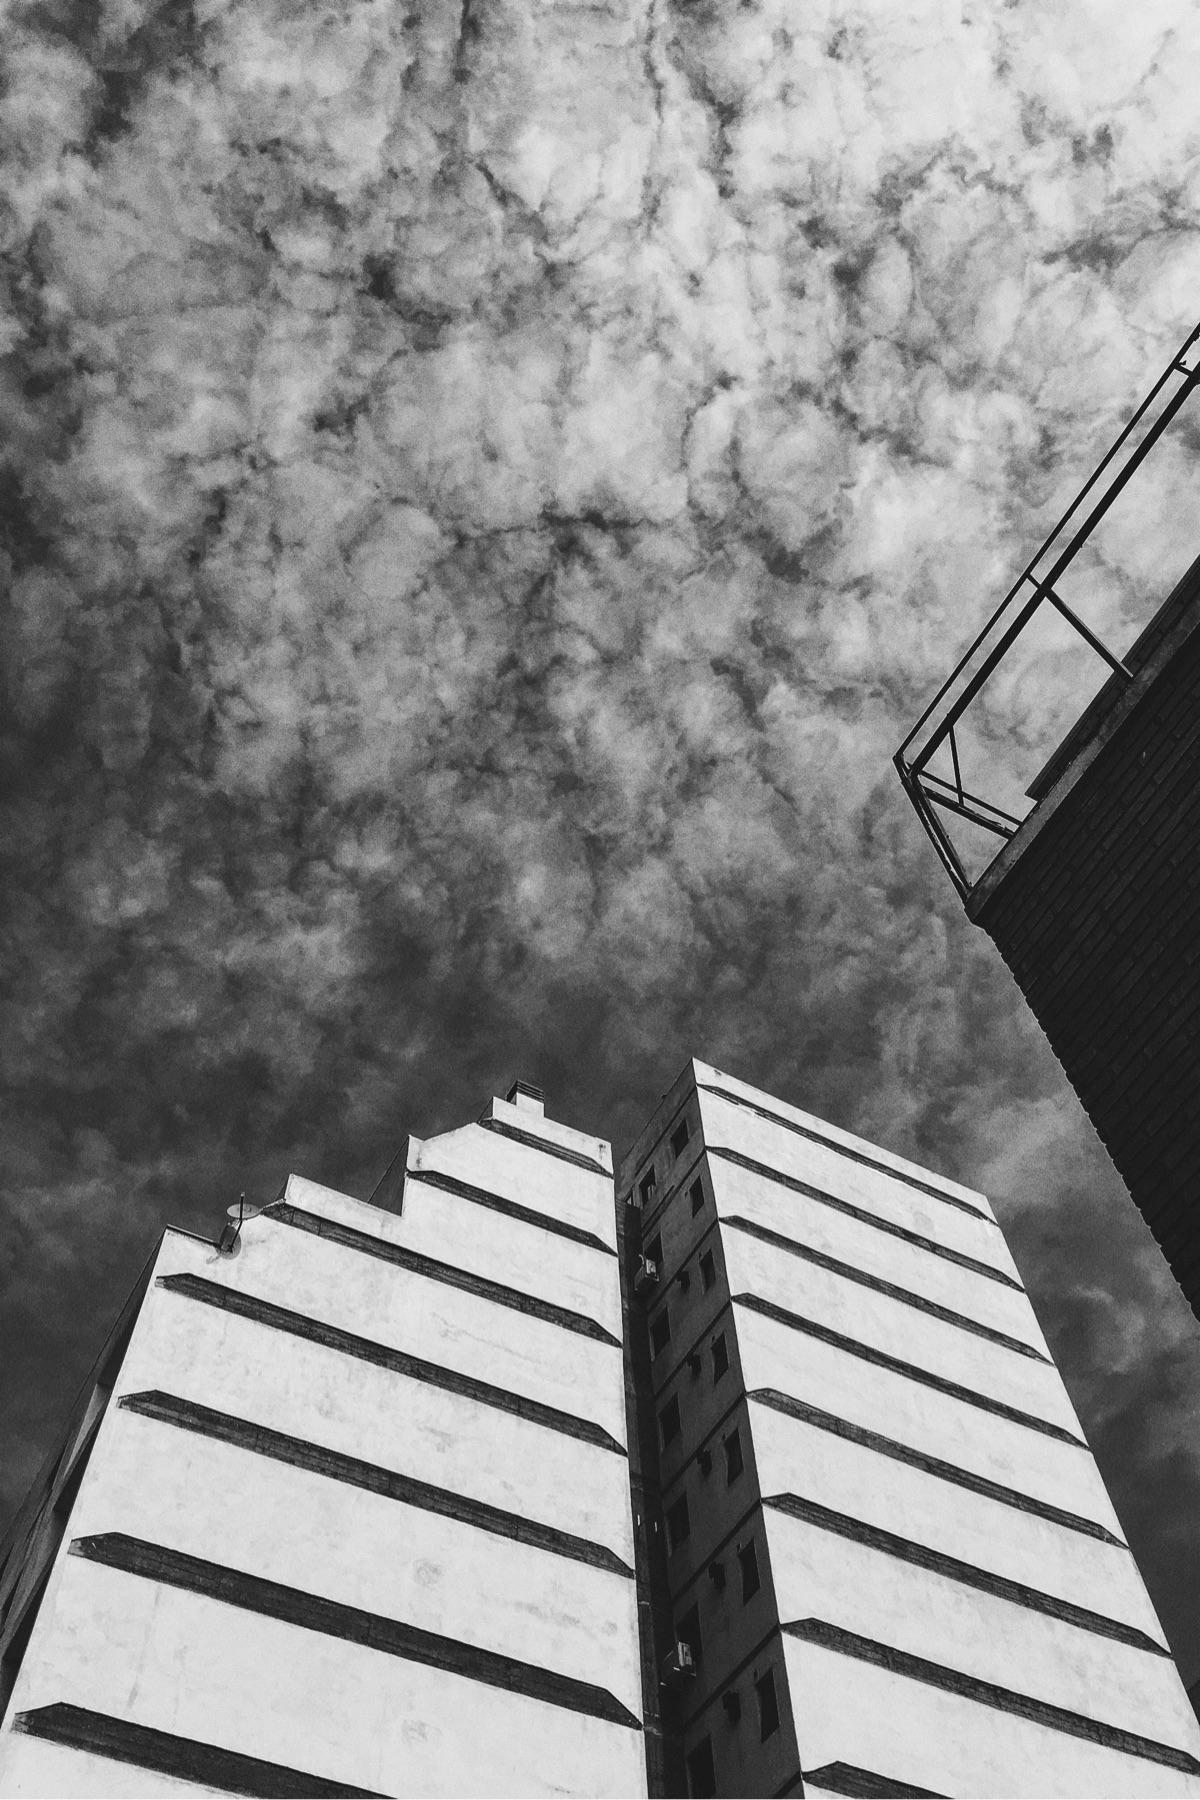 streetphotography rhythm textur - emefranco | ello